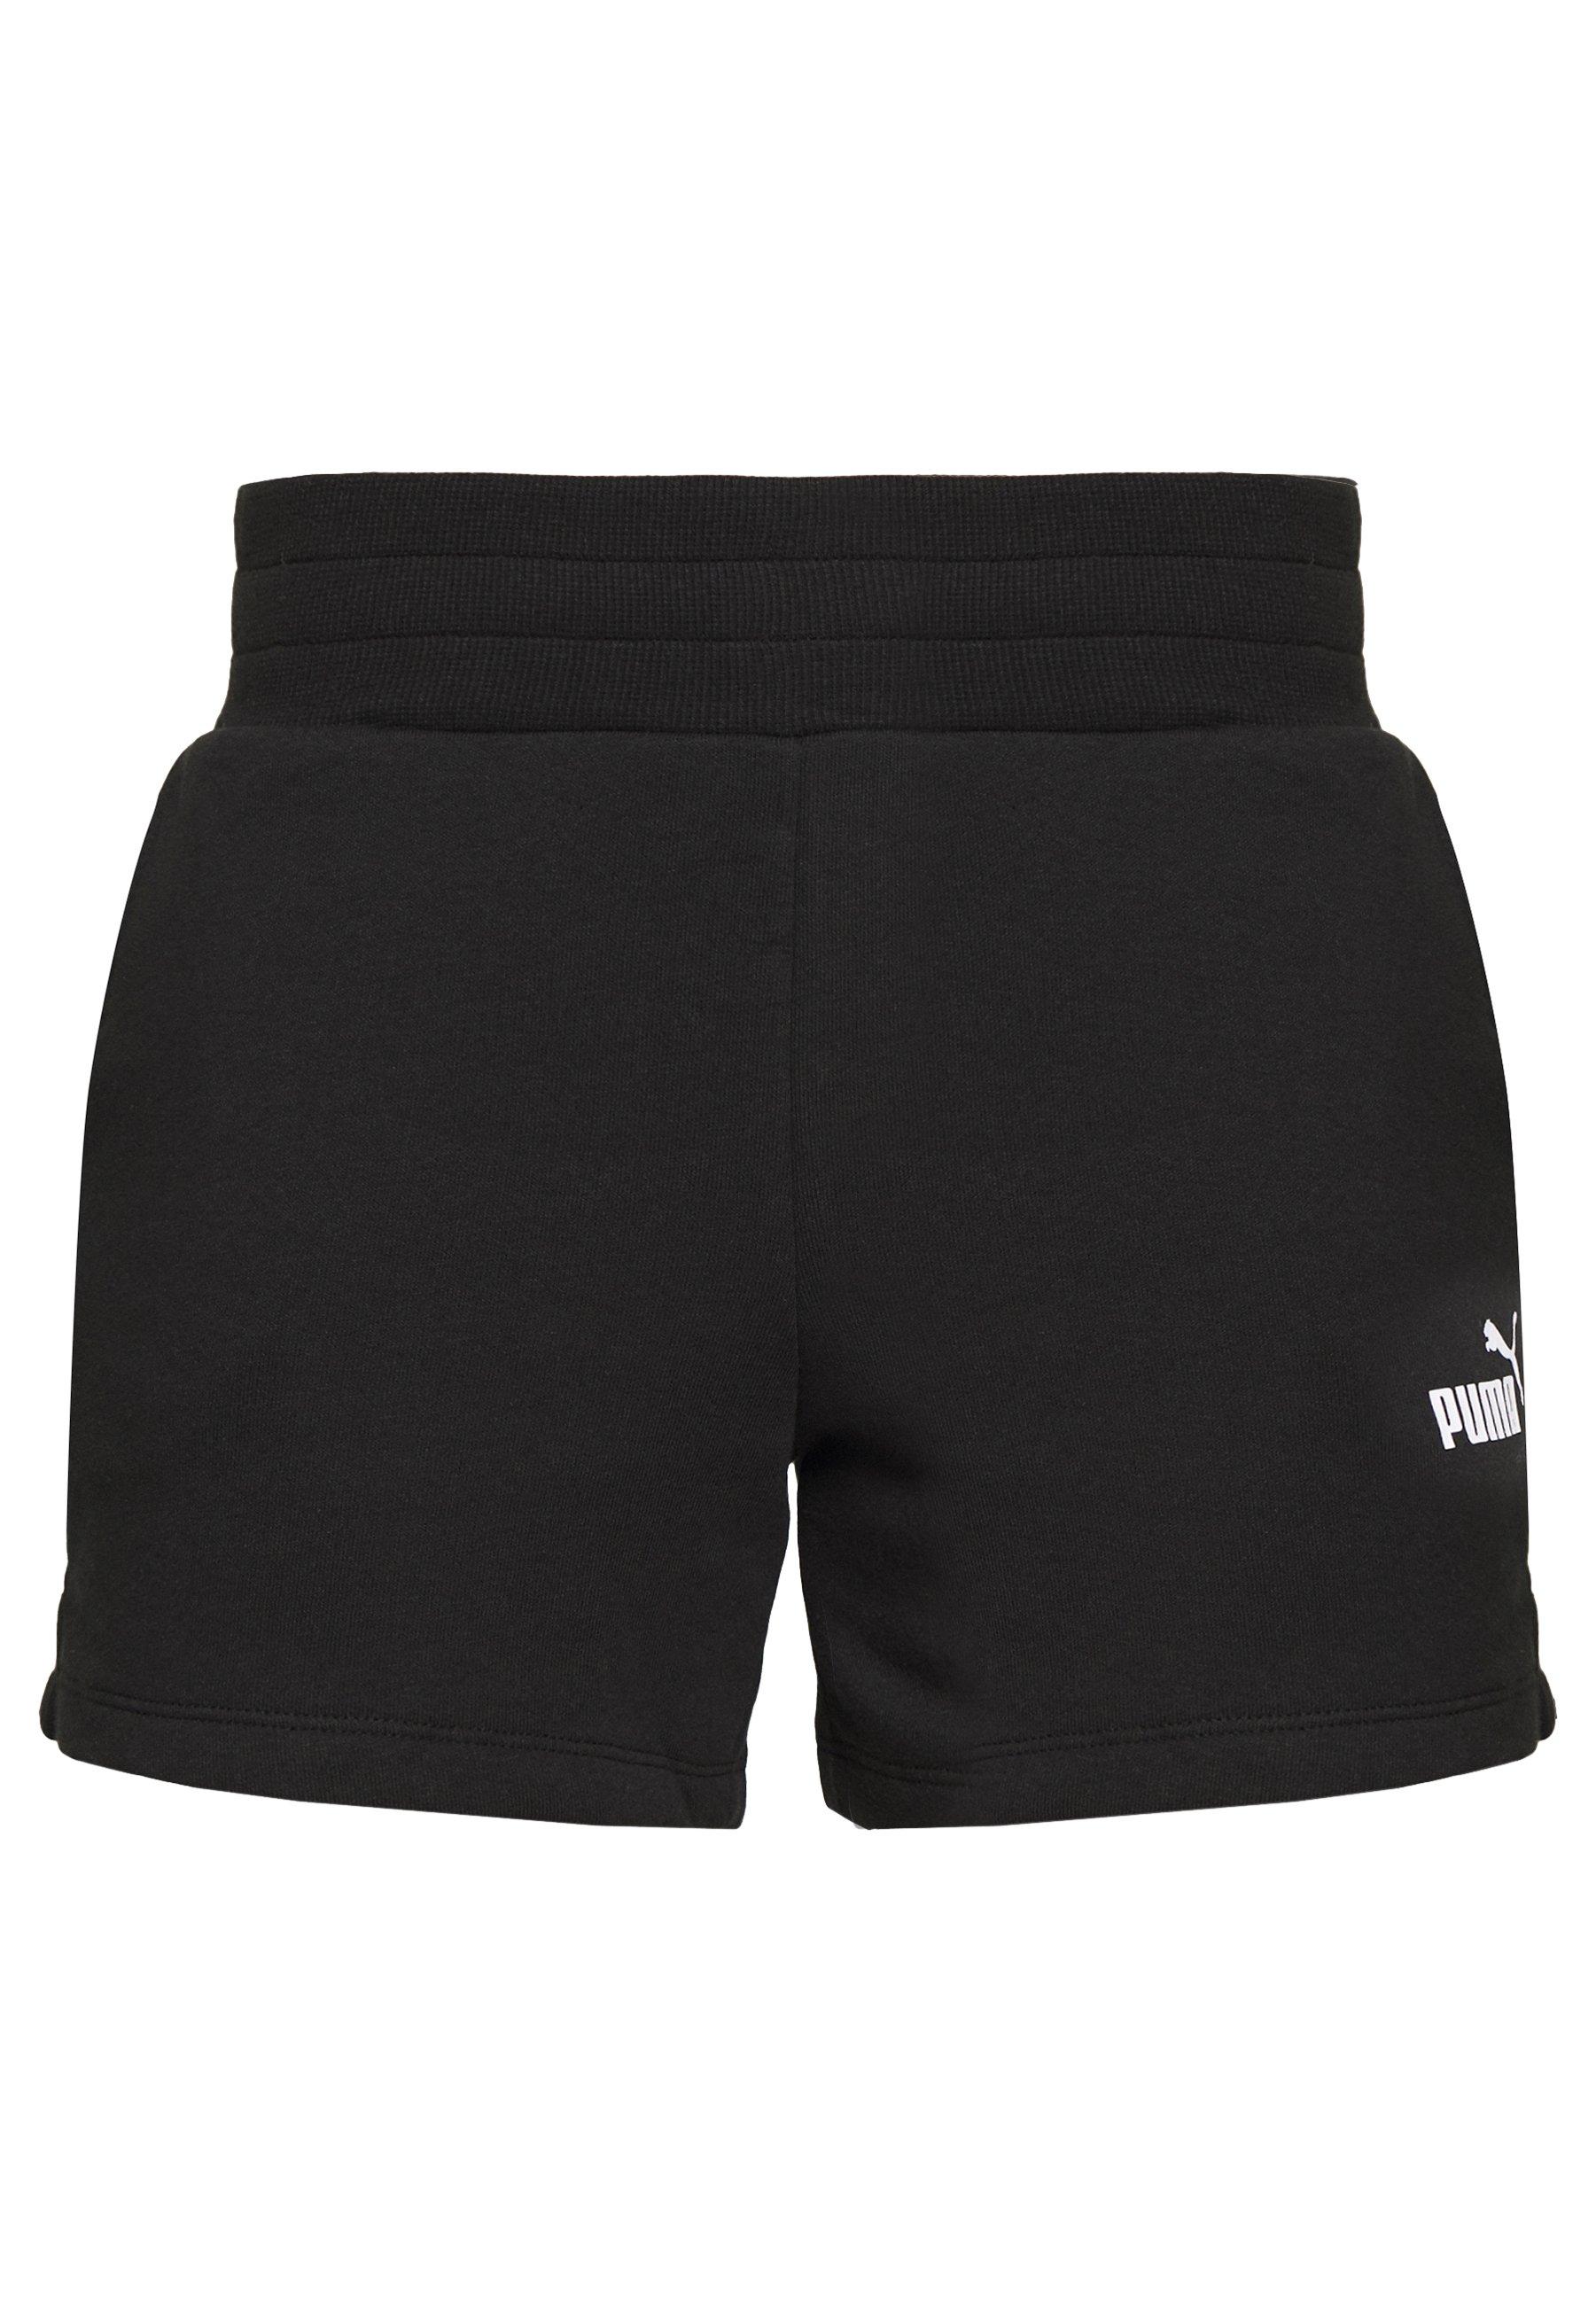 Damen SHORTS - kurze Sporthose